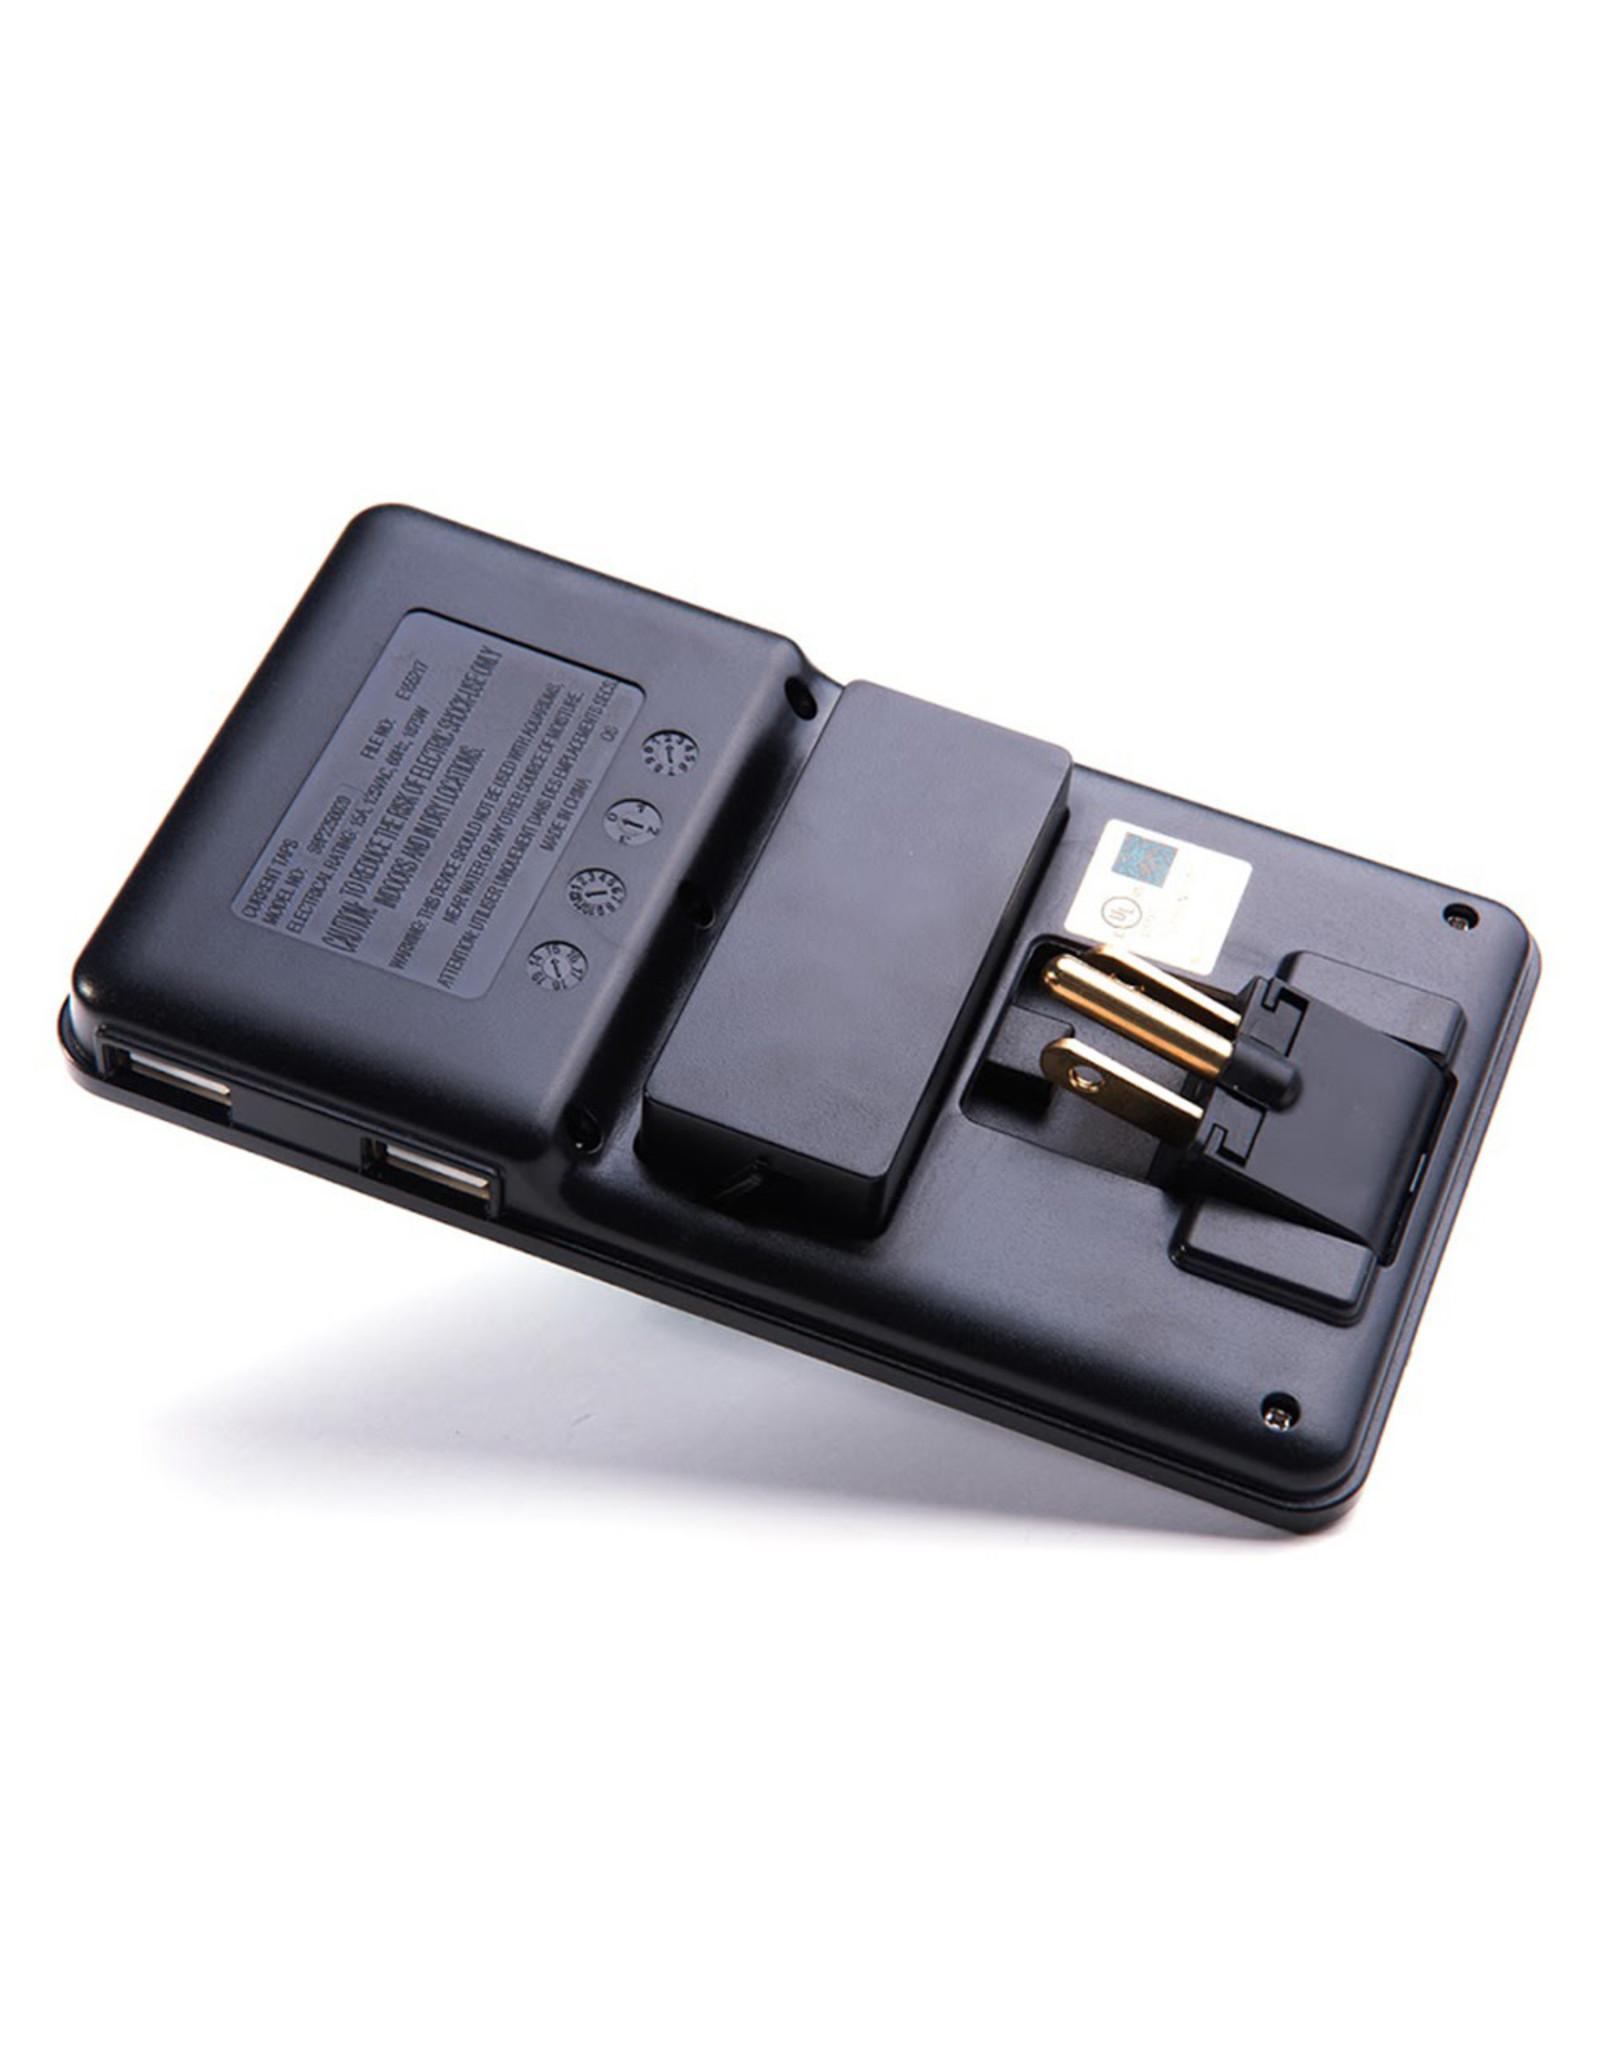 BlueDiamond BlueDiamond, Expand Slim + Charge, 2 Outlets + 2 USB Charging Ports